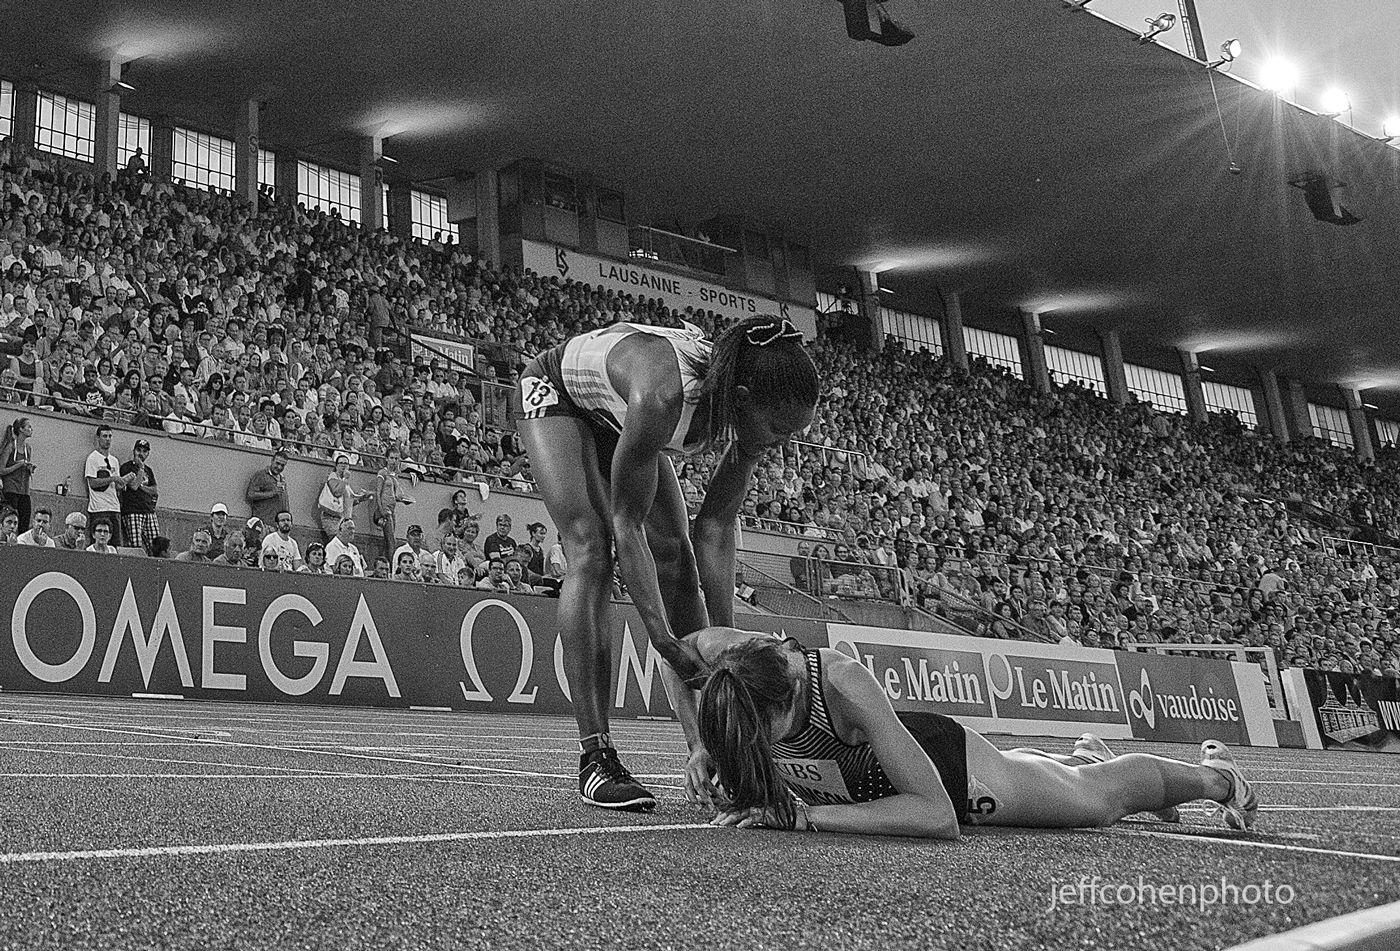 1r2016_athletissima_lausanne_efraimson_3000m_jeff_cohen_photo_2388_web.jpg